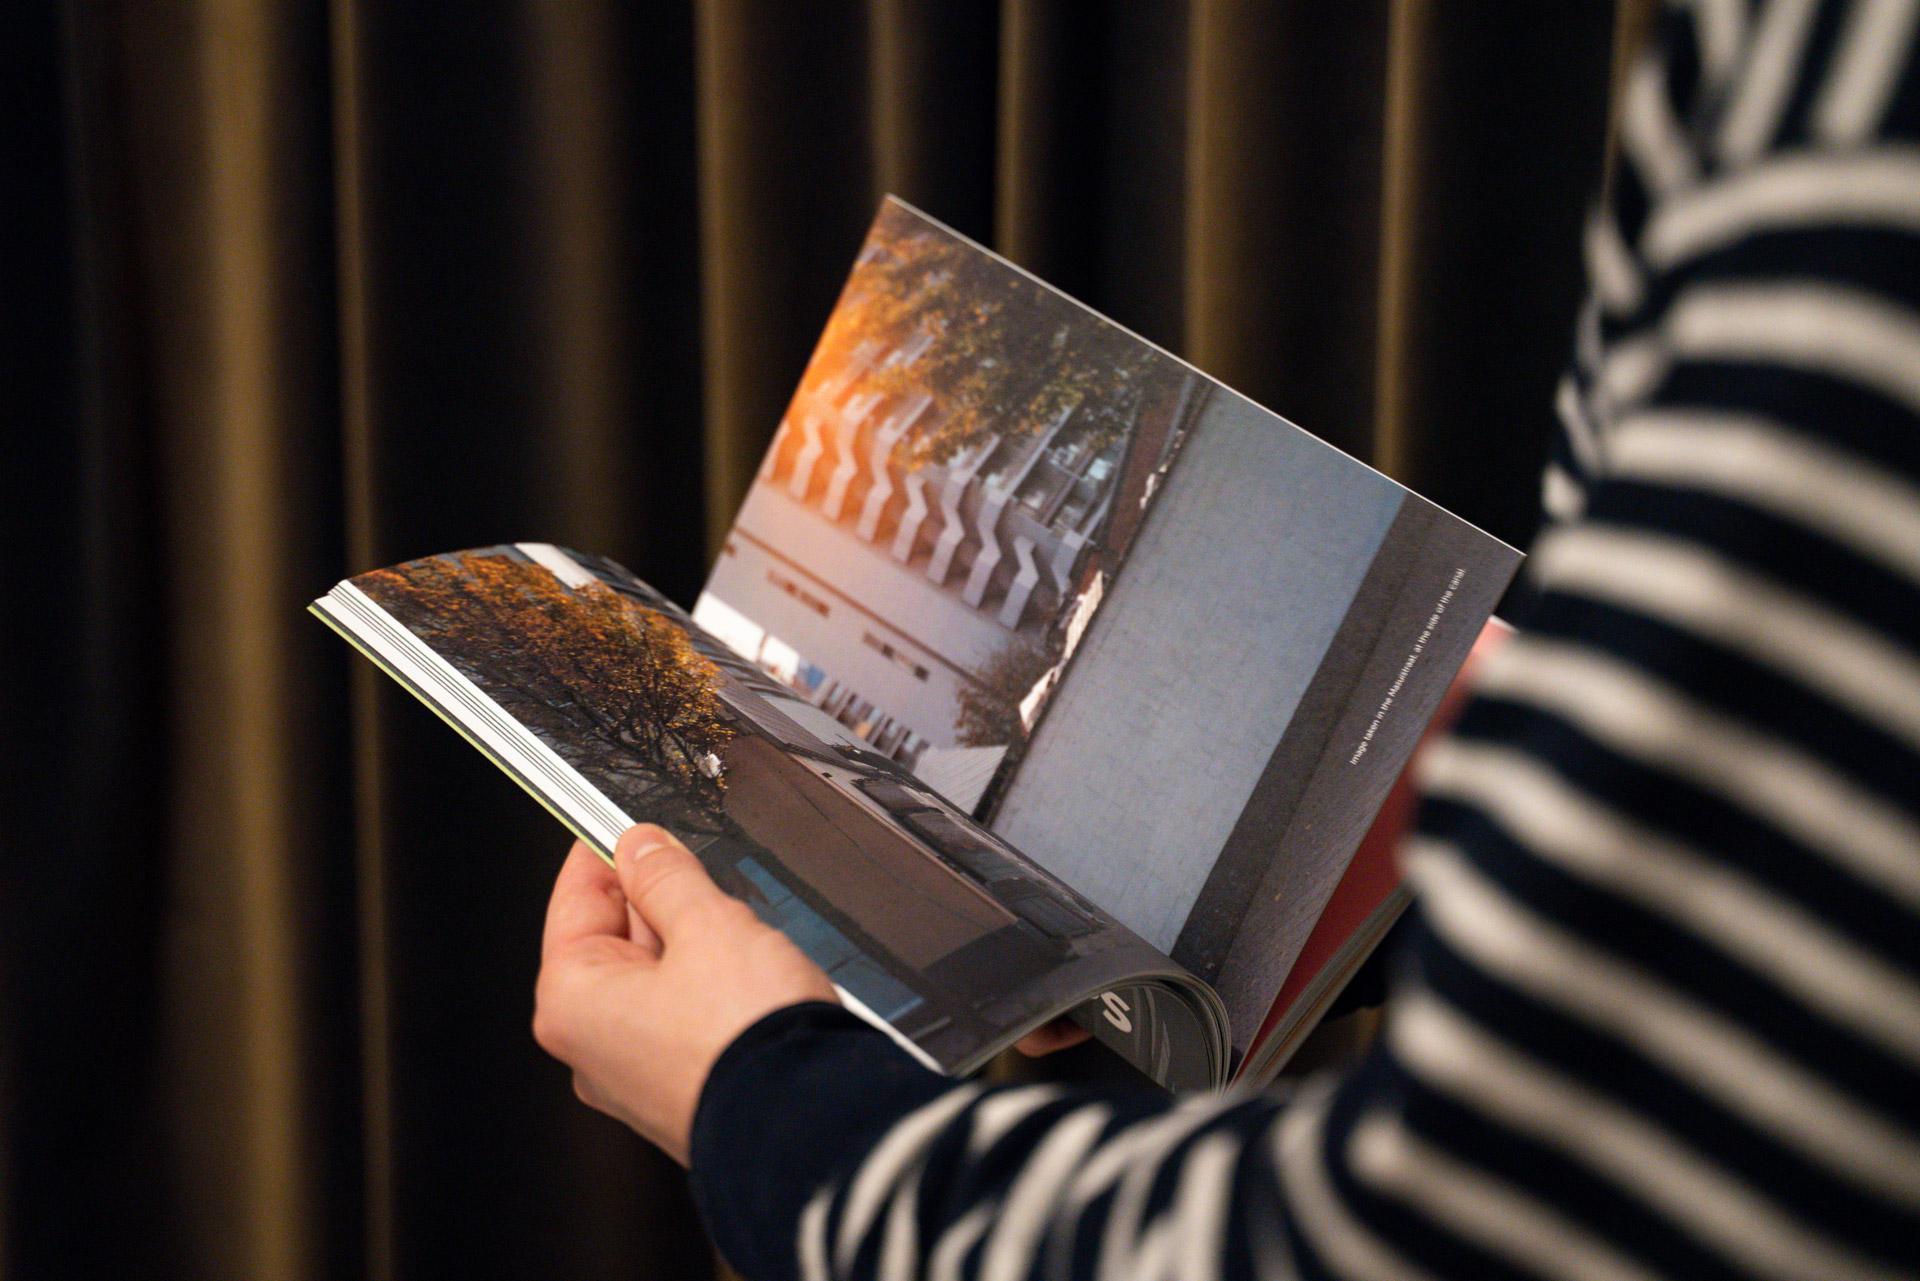 schaarbeek_speak_photo_printed_book